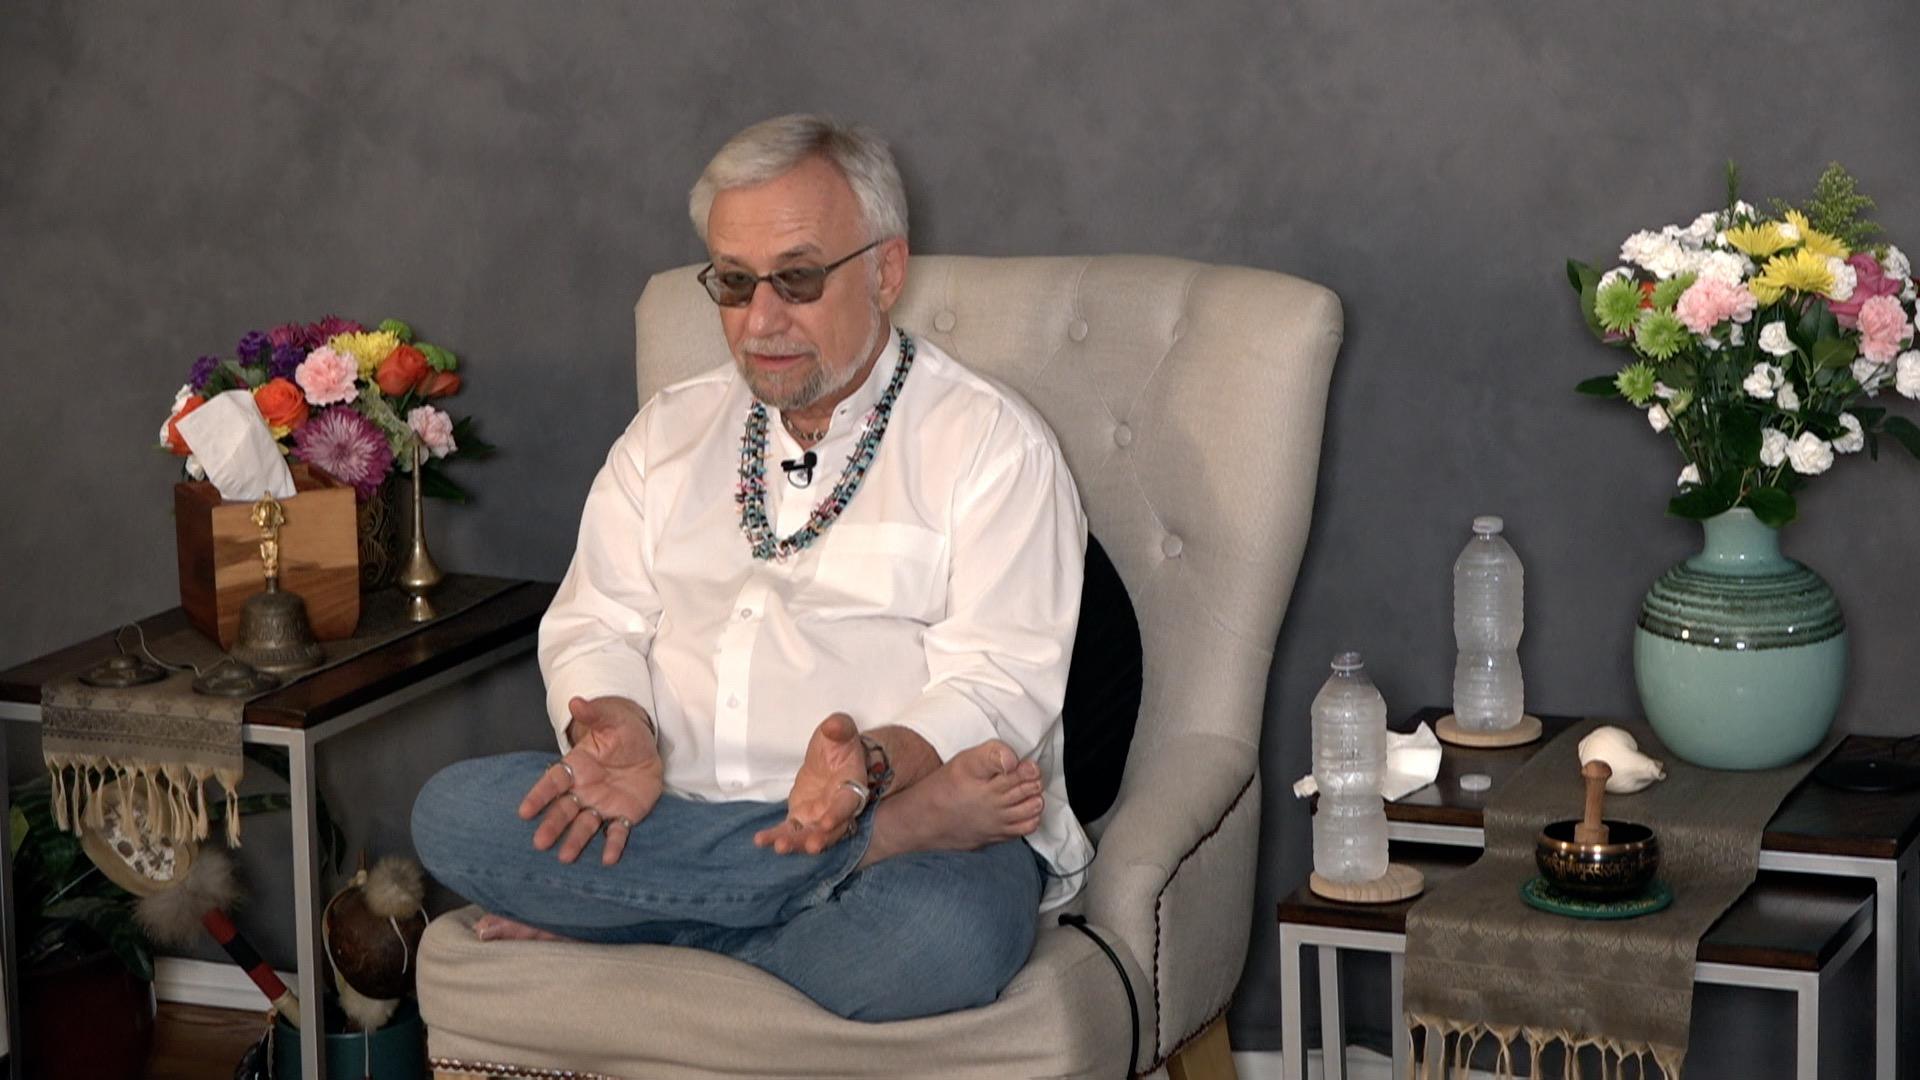 18-March-2019 Spiritual Discourse with Swami Premodaya 02.jpg